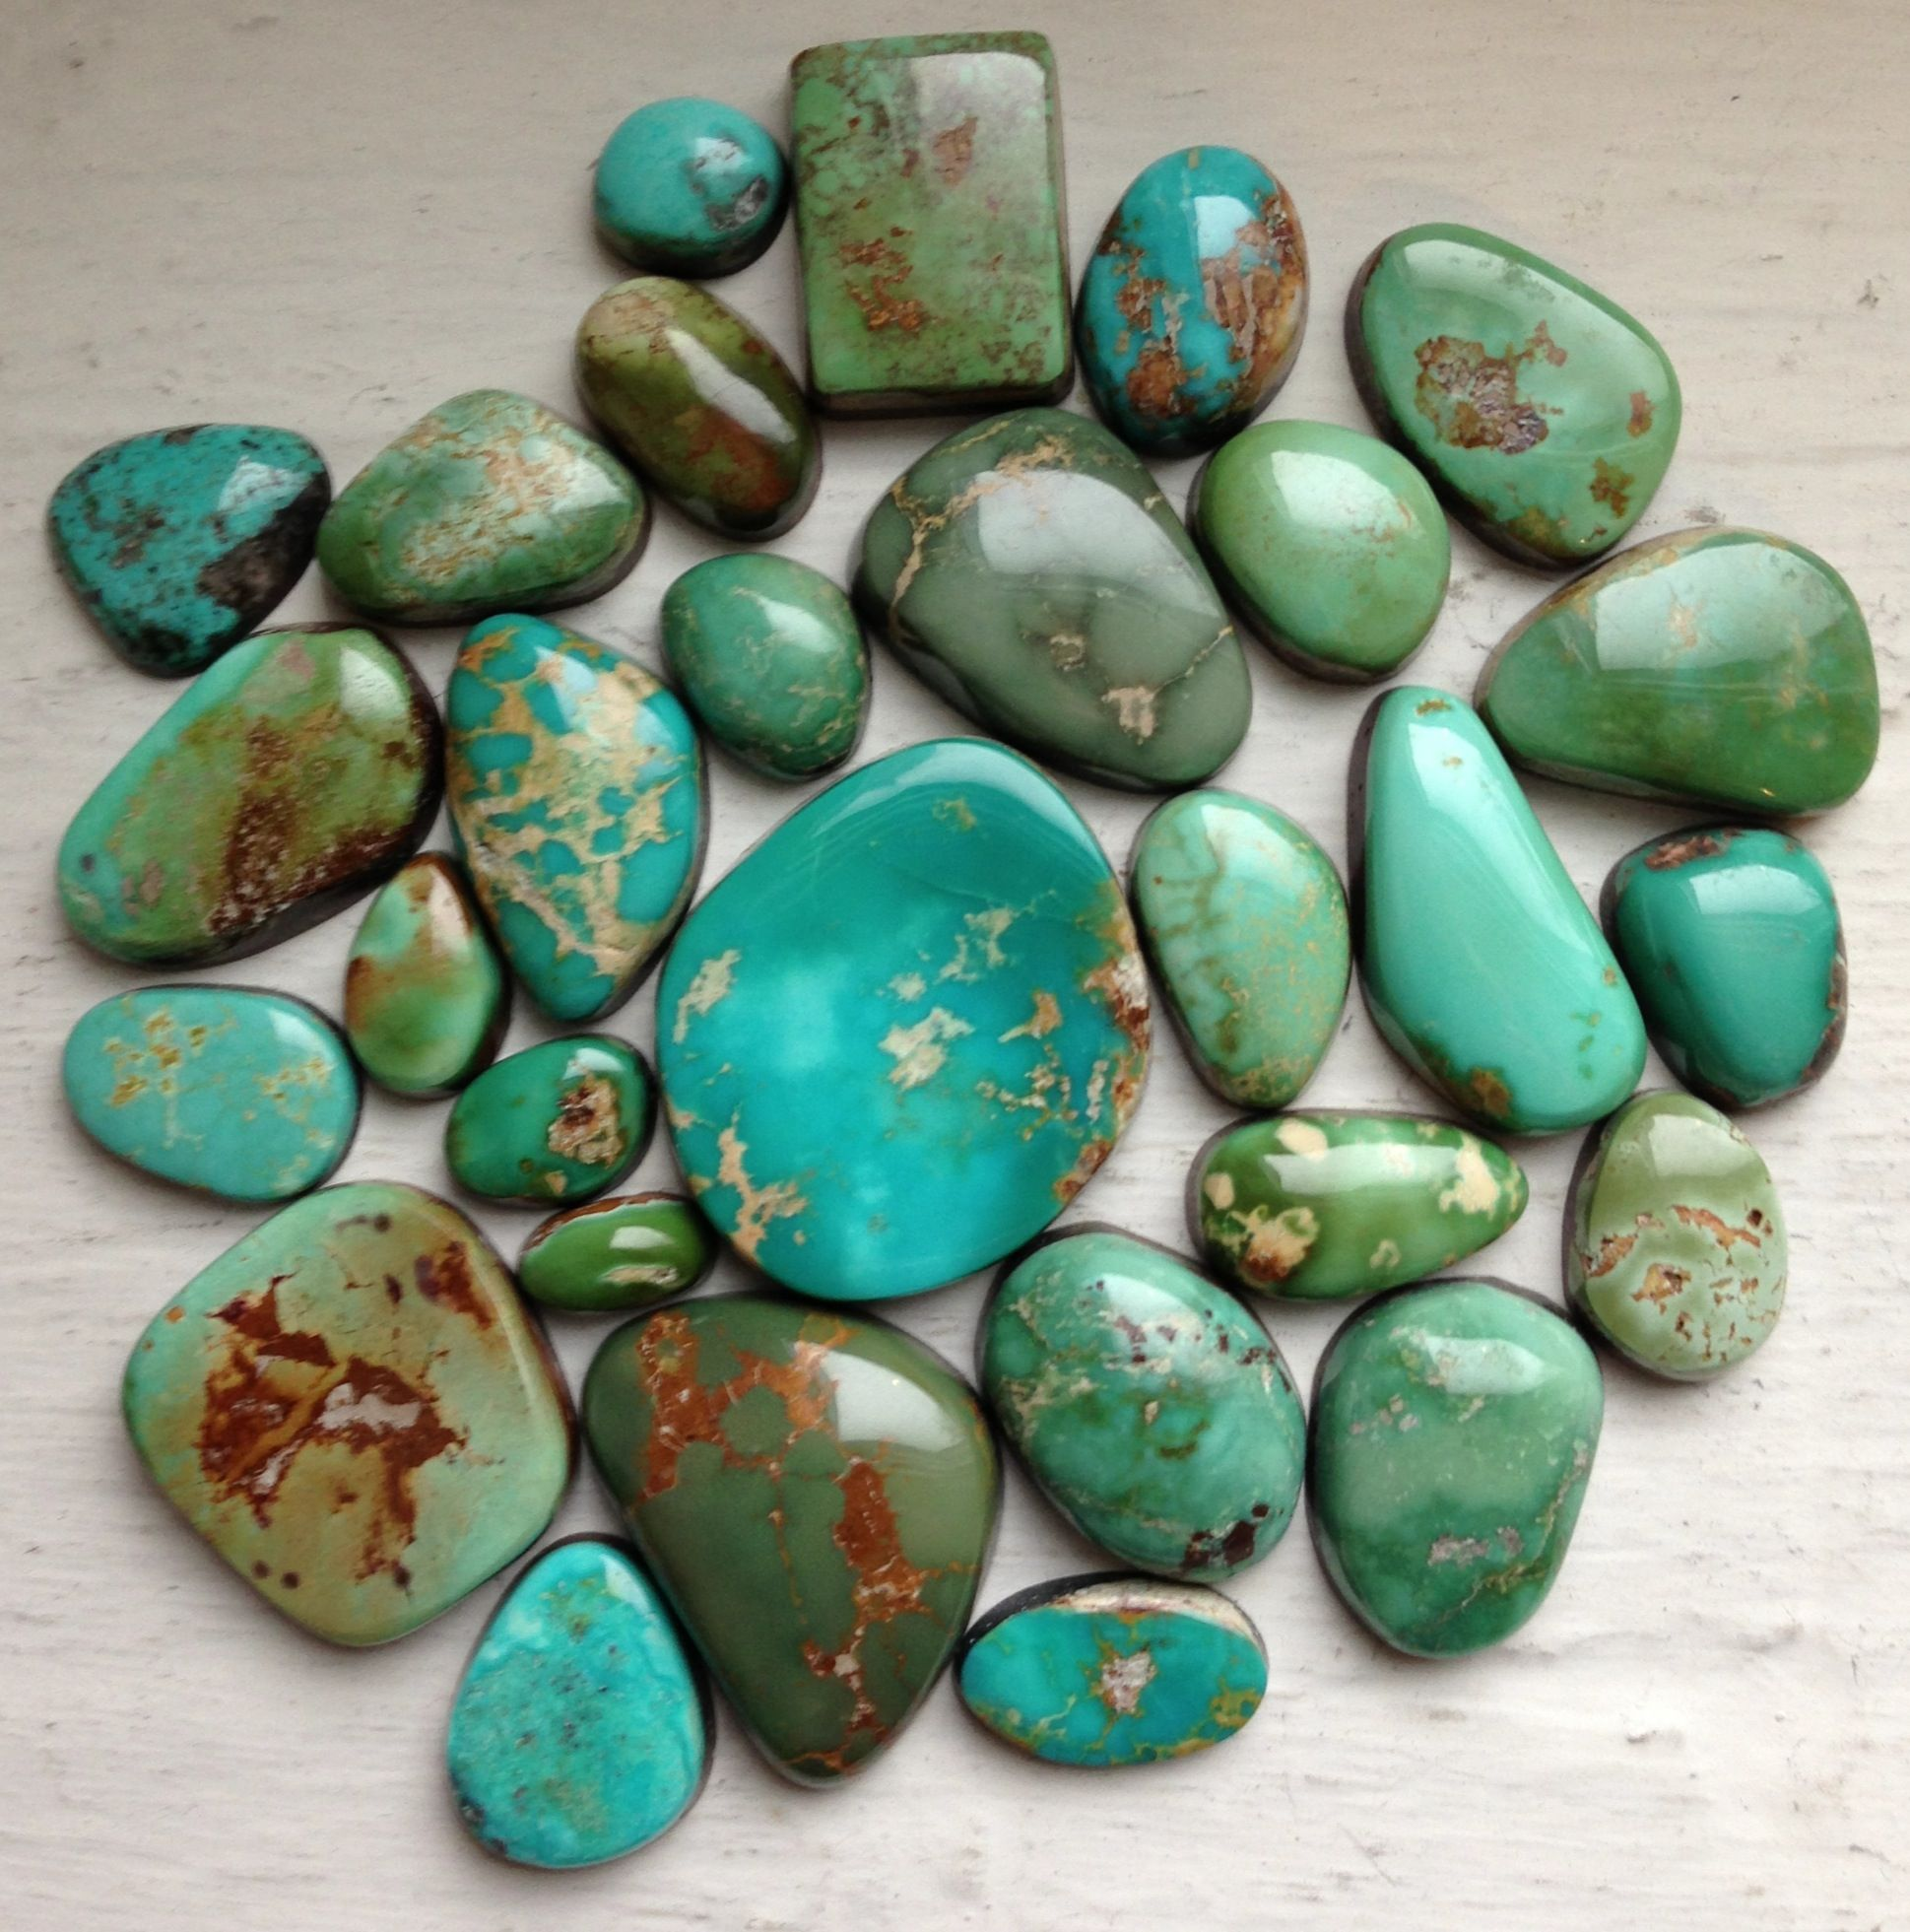 King Manassa Turquoise stone